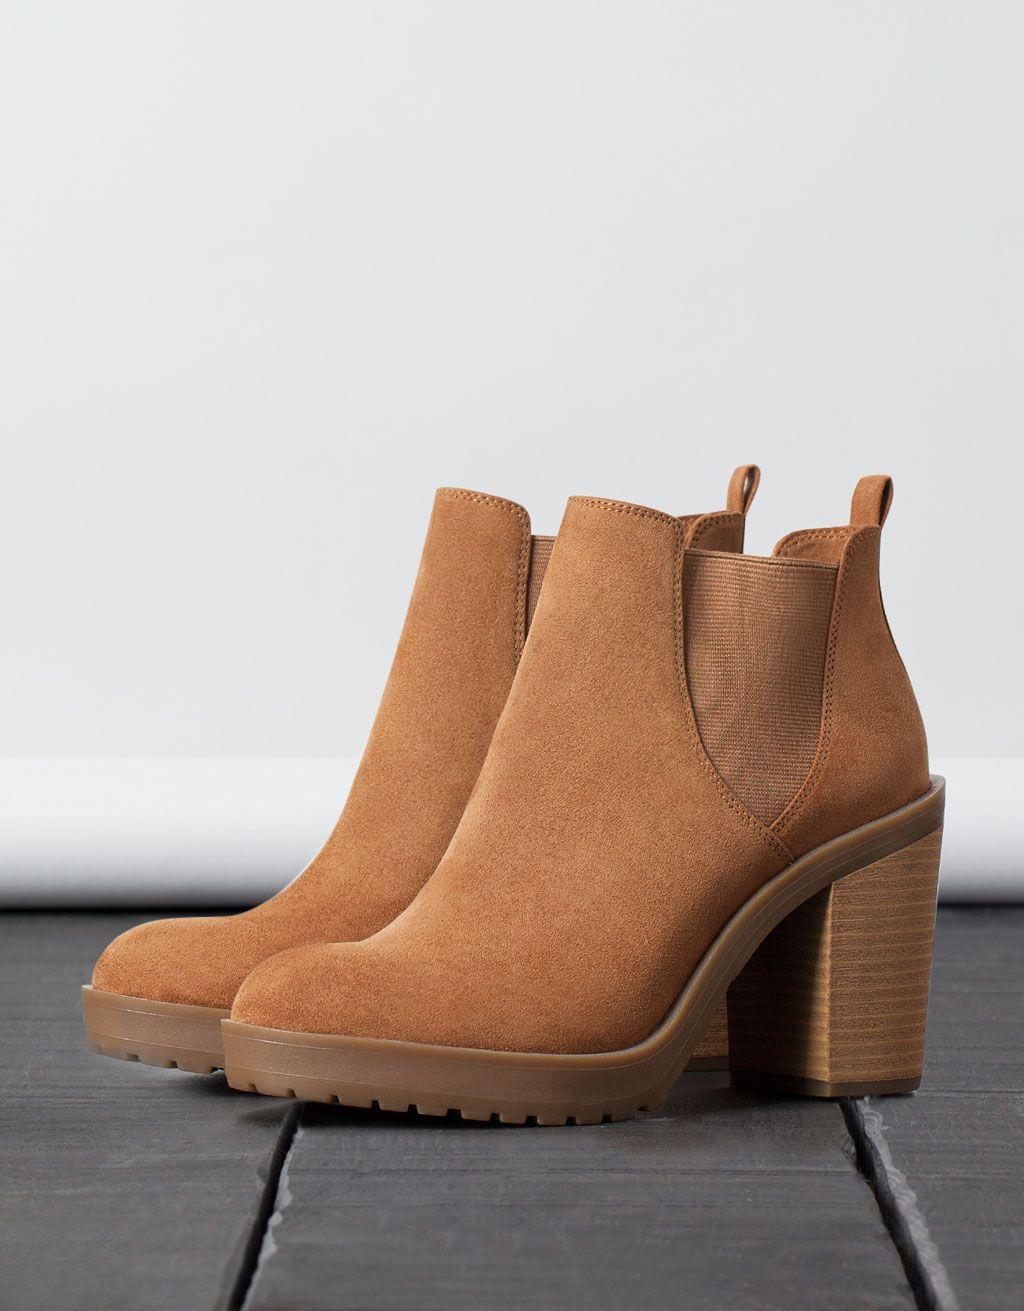 07104cad Botín Tacón Elástico | zapatos | Stiefeletten absatz, Schuhe damen ...